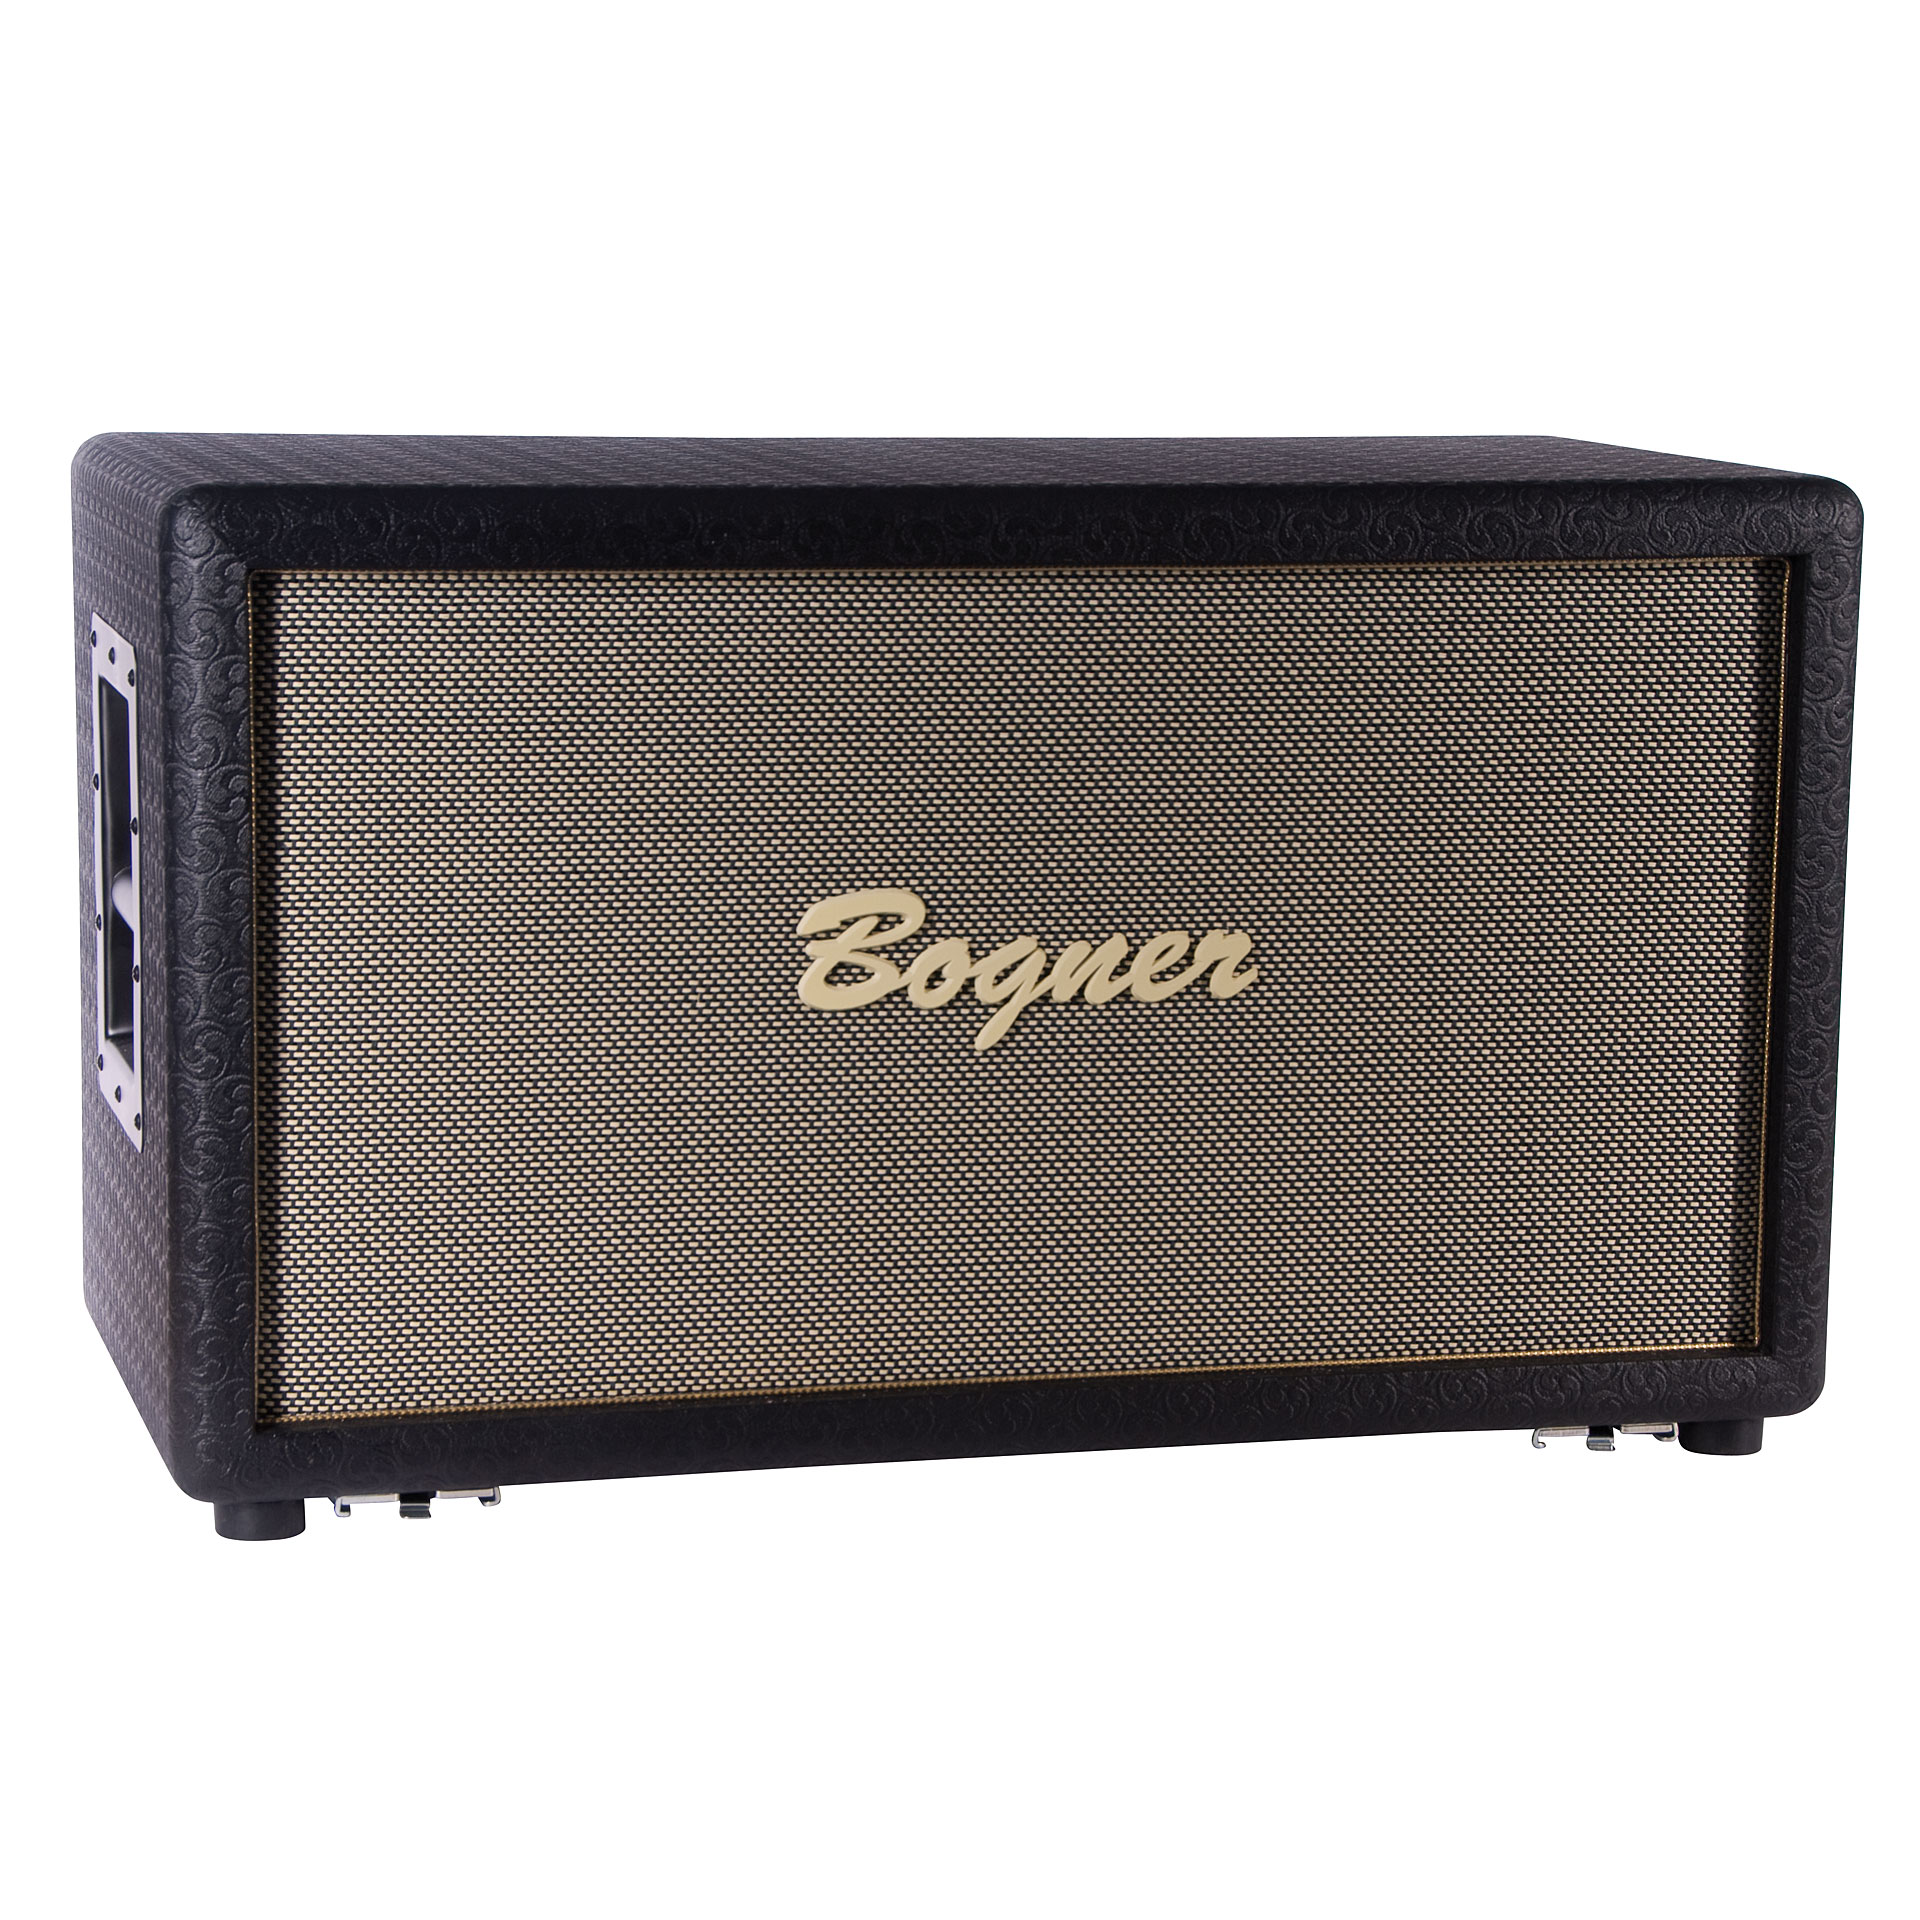 Bogner XTC Ecstasy 20th Anniversary EL34 /· Cabezal guitarra